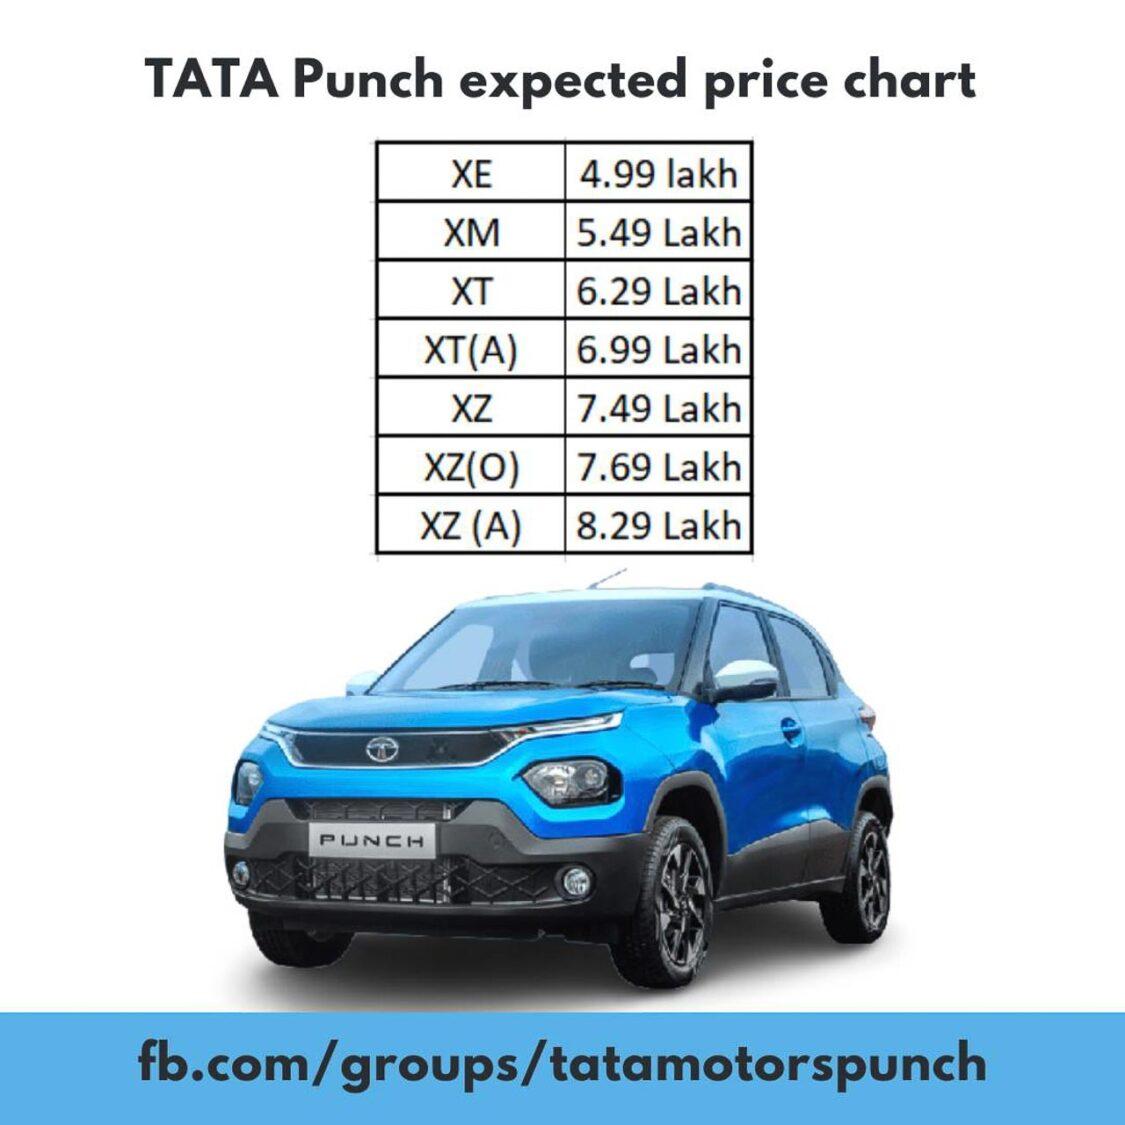 Tata Punch Price Range - Unofficial